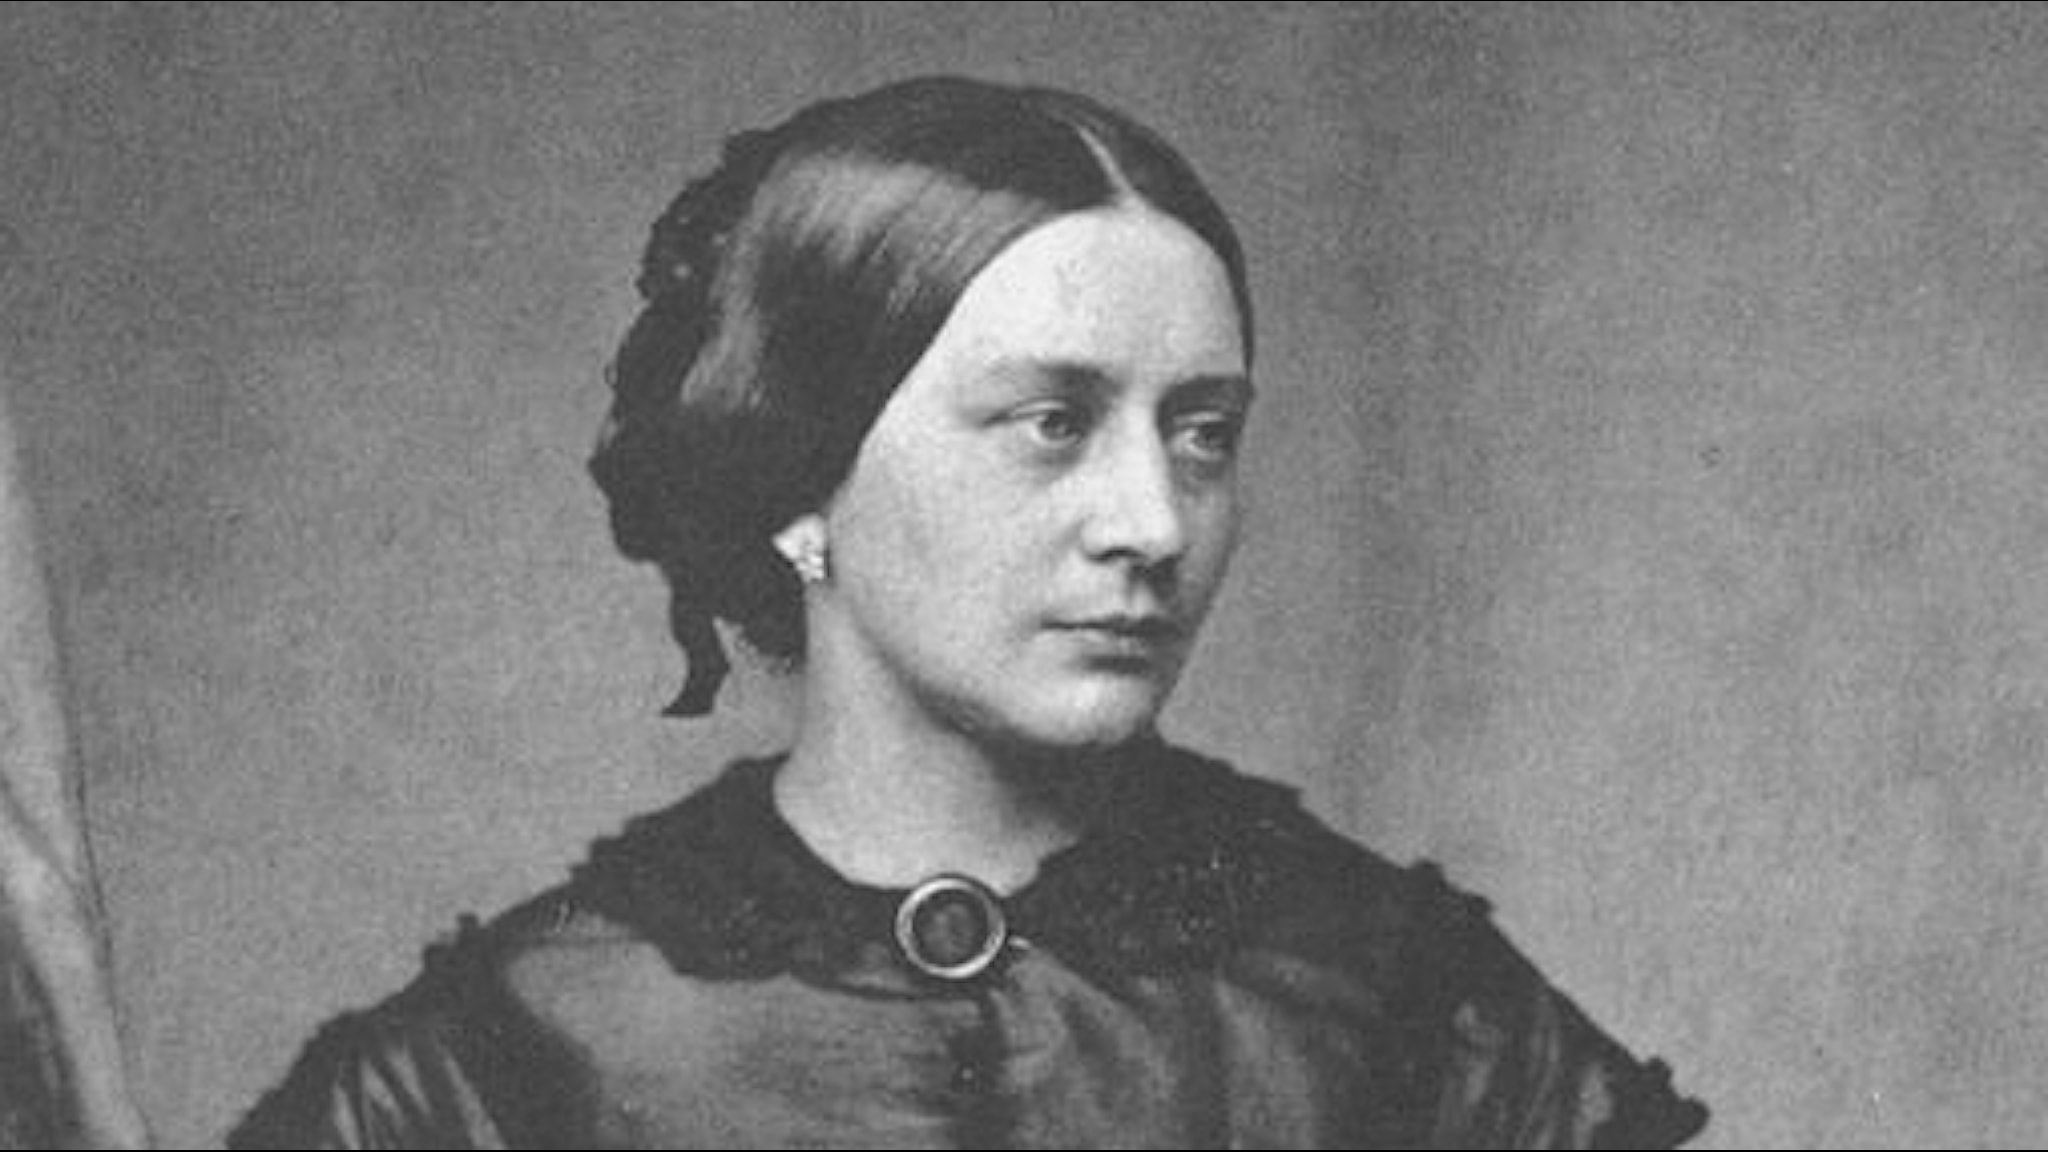 Clara Schumann cirka 1850. Foto: Franz Hanfstaengl/Wikimedia commons.